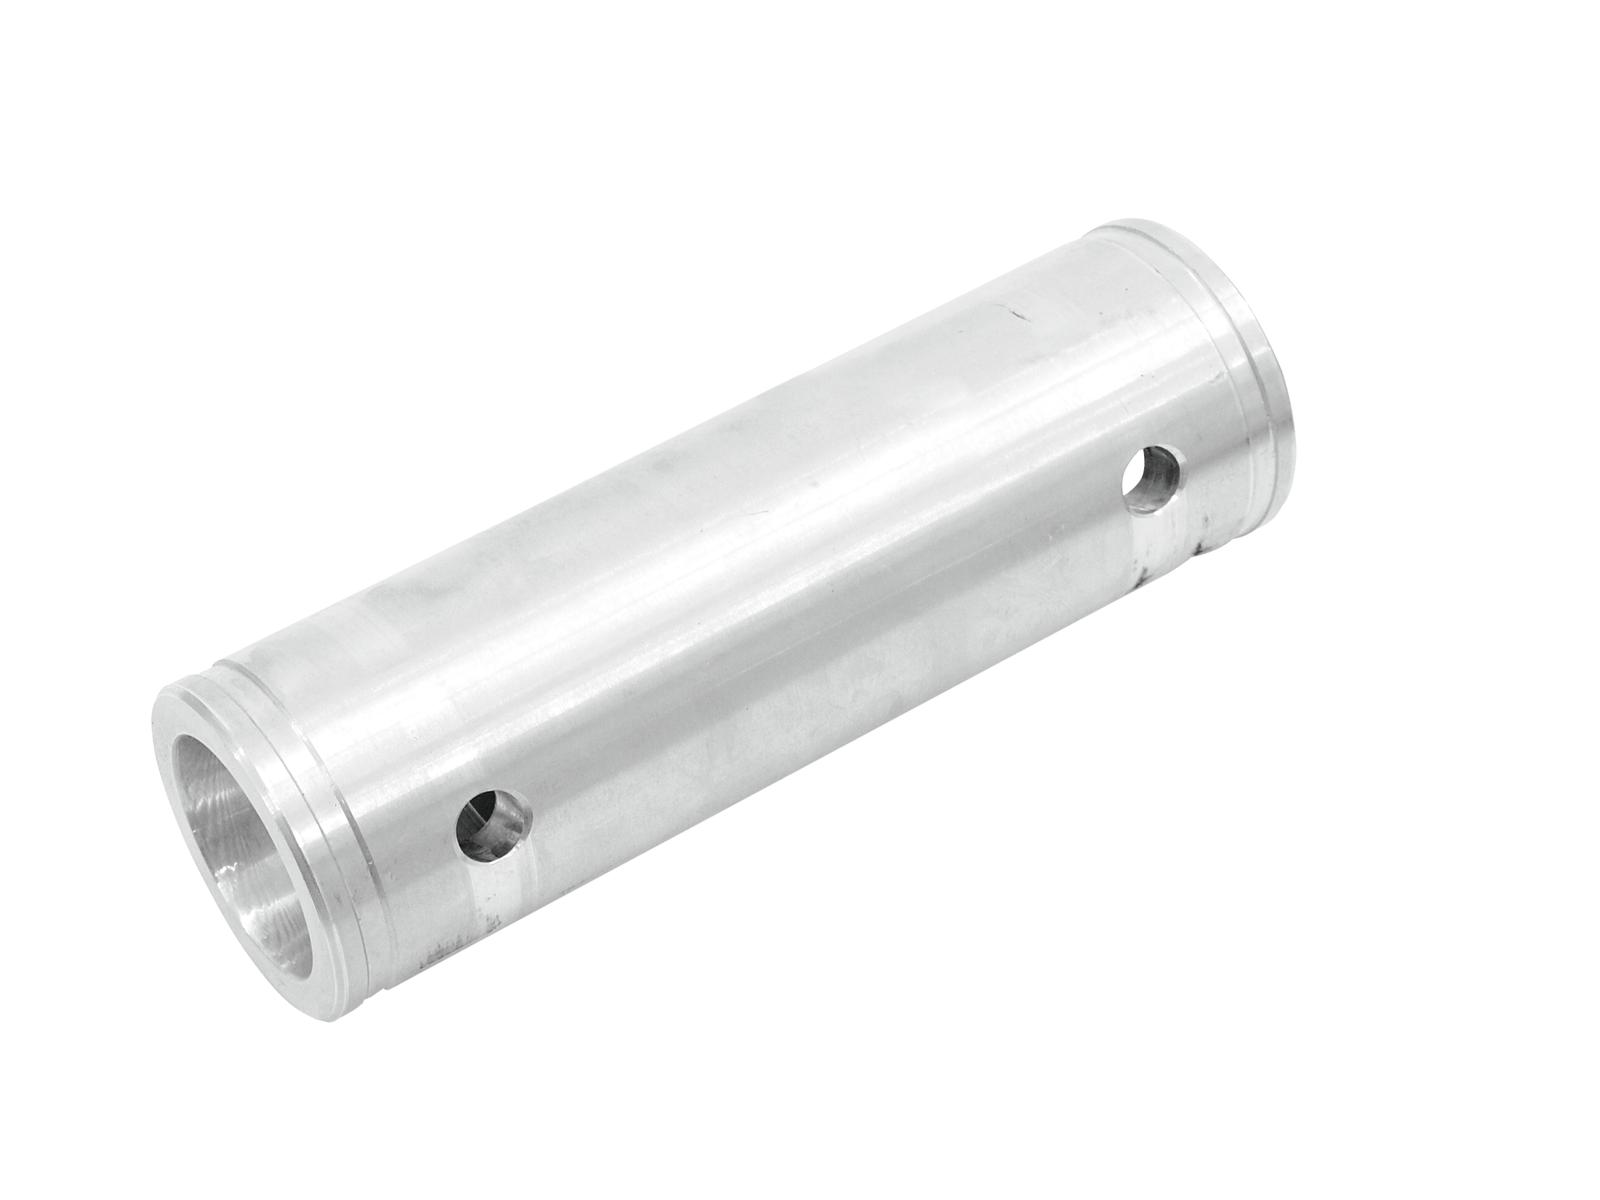 Accessori per americana traliccio truss QUICK-LOCK ALUTRUSS GL33-ET34 Distanziale femmina 145mm